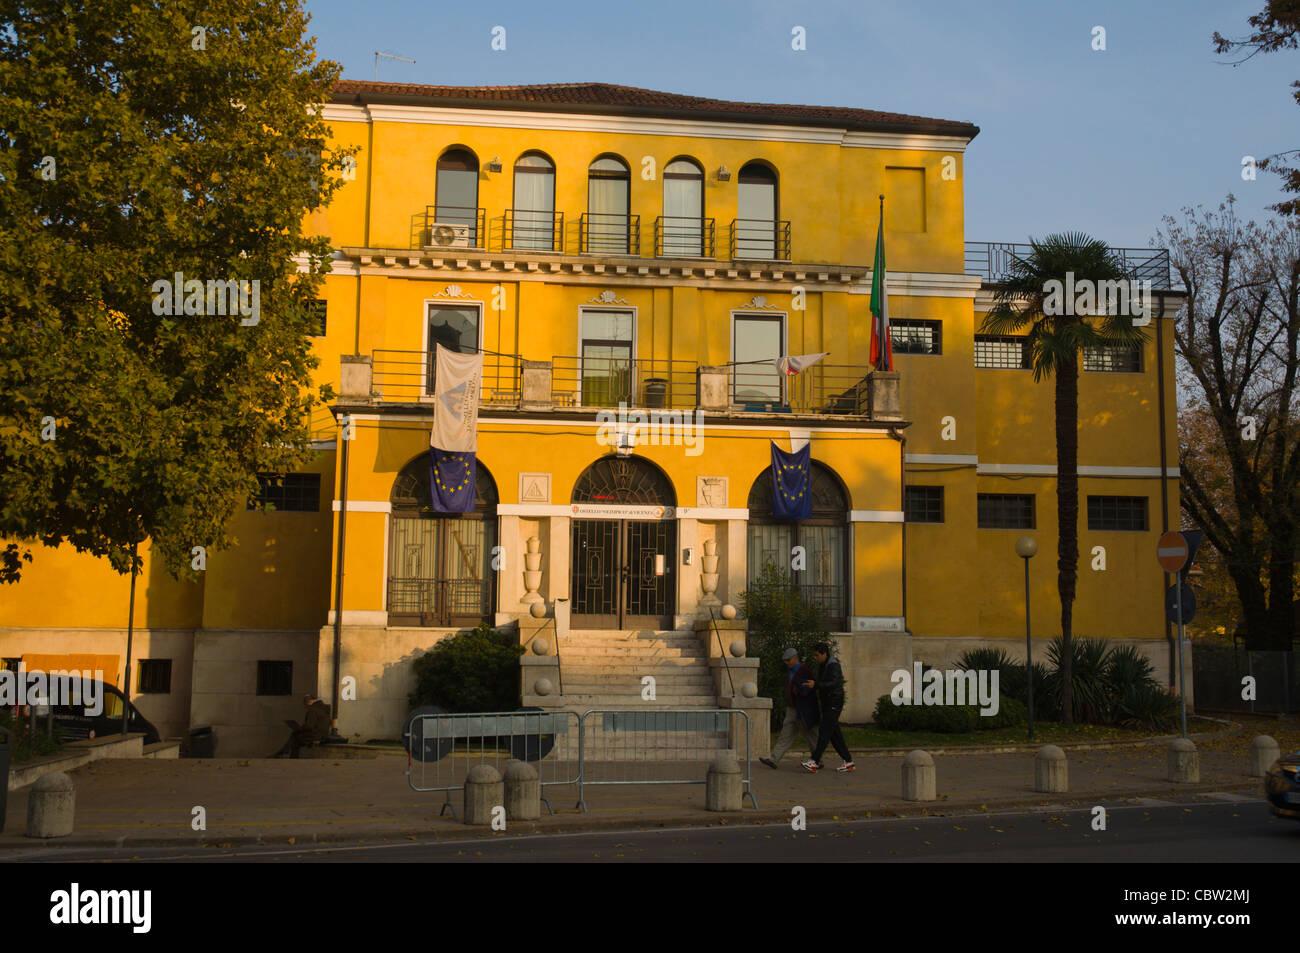 Art Nouveau building housing Ostello Olimpico hostel Piazza Matteotti central Vicenza the Veneto region northern - Stock Image